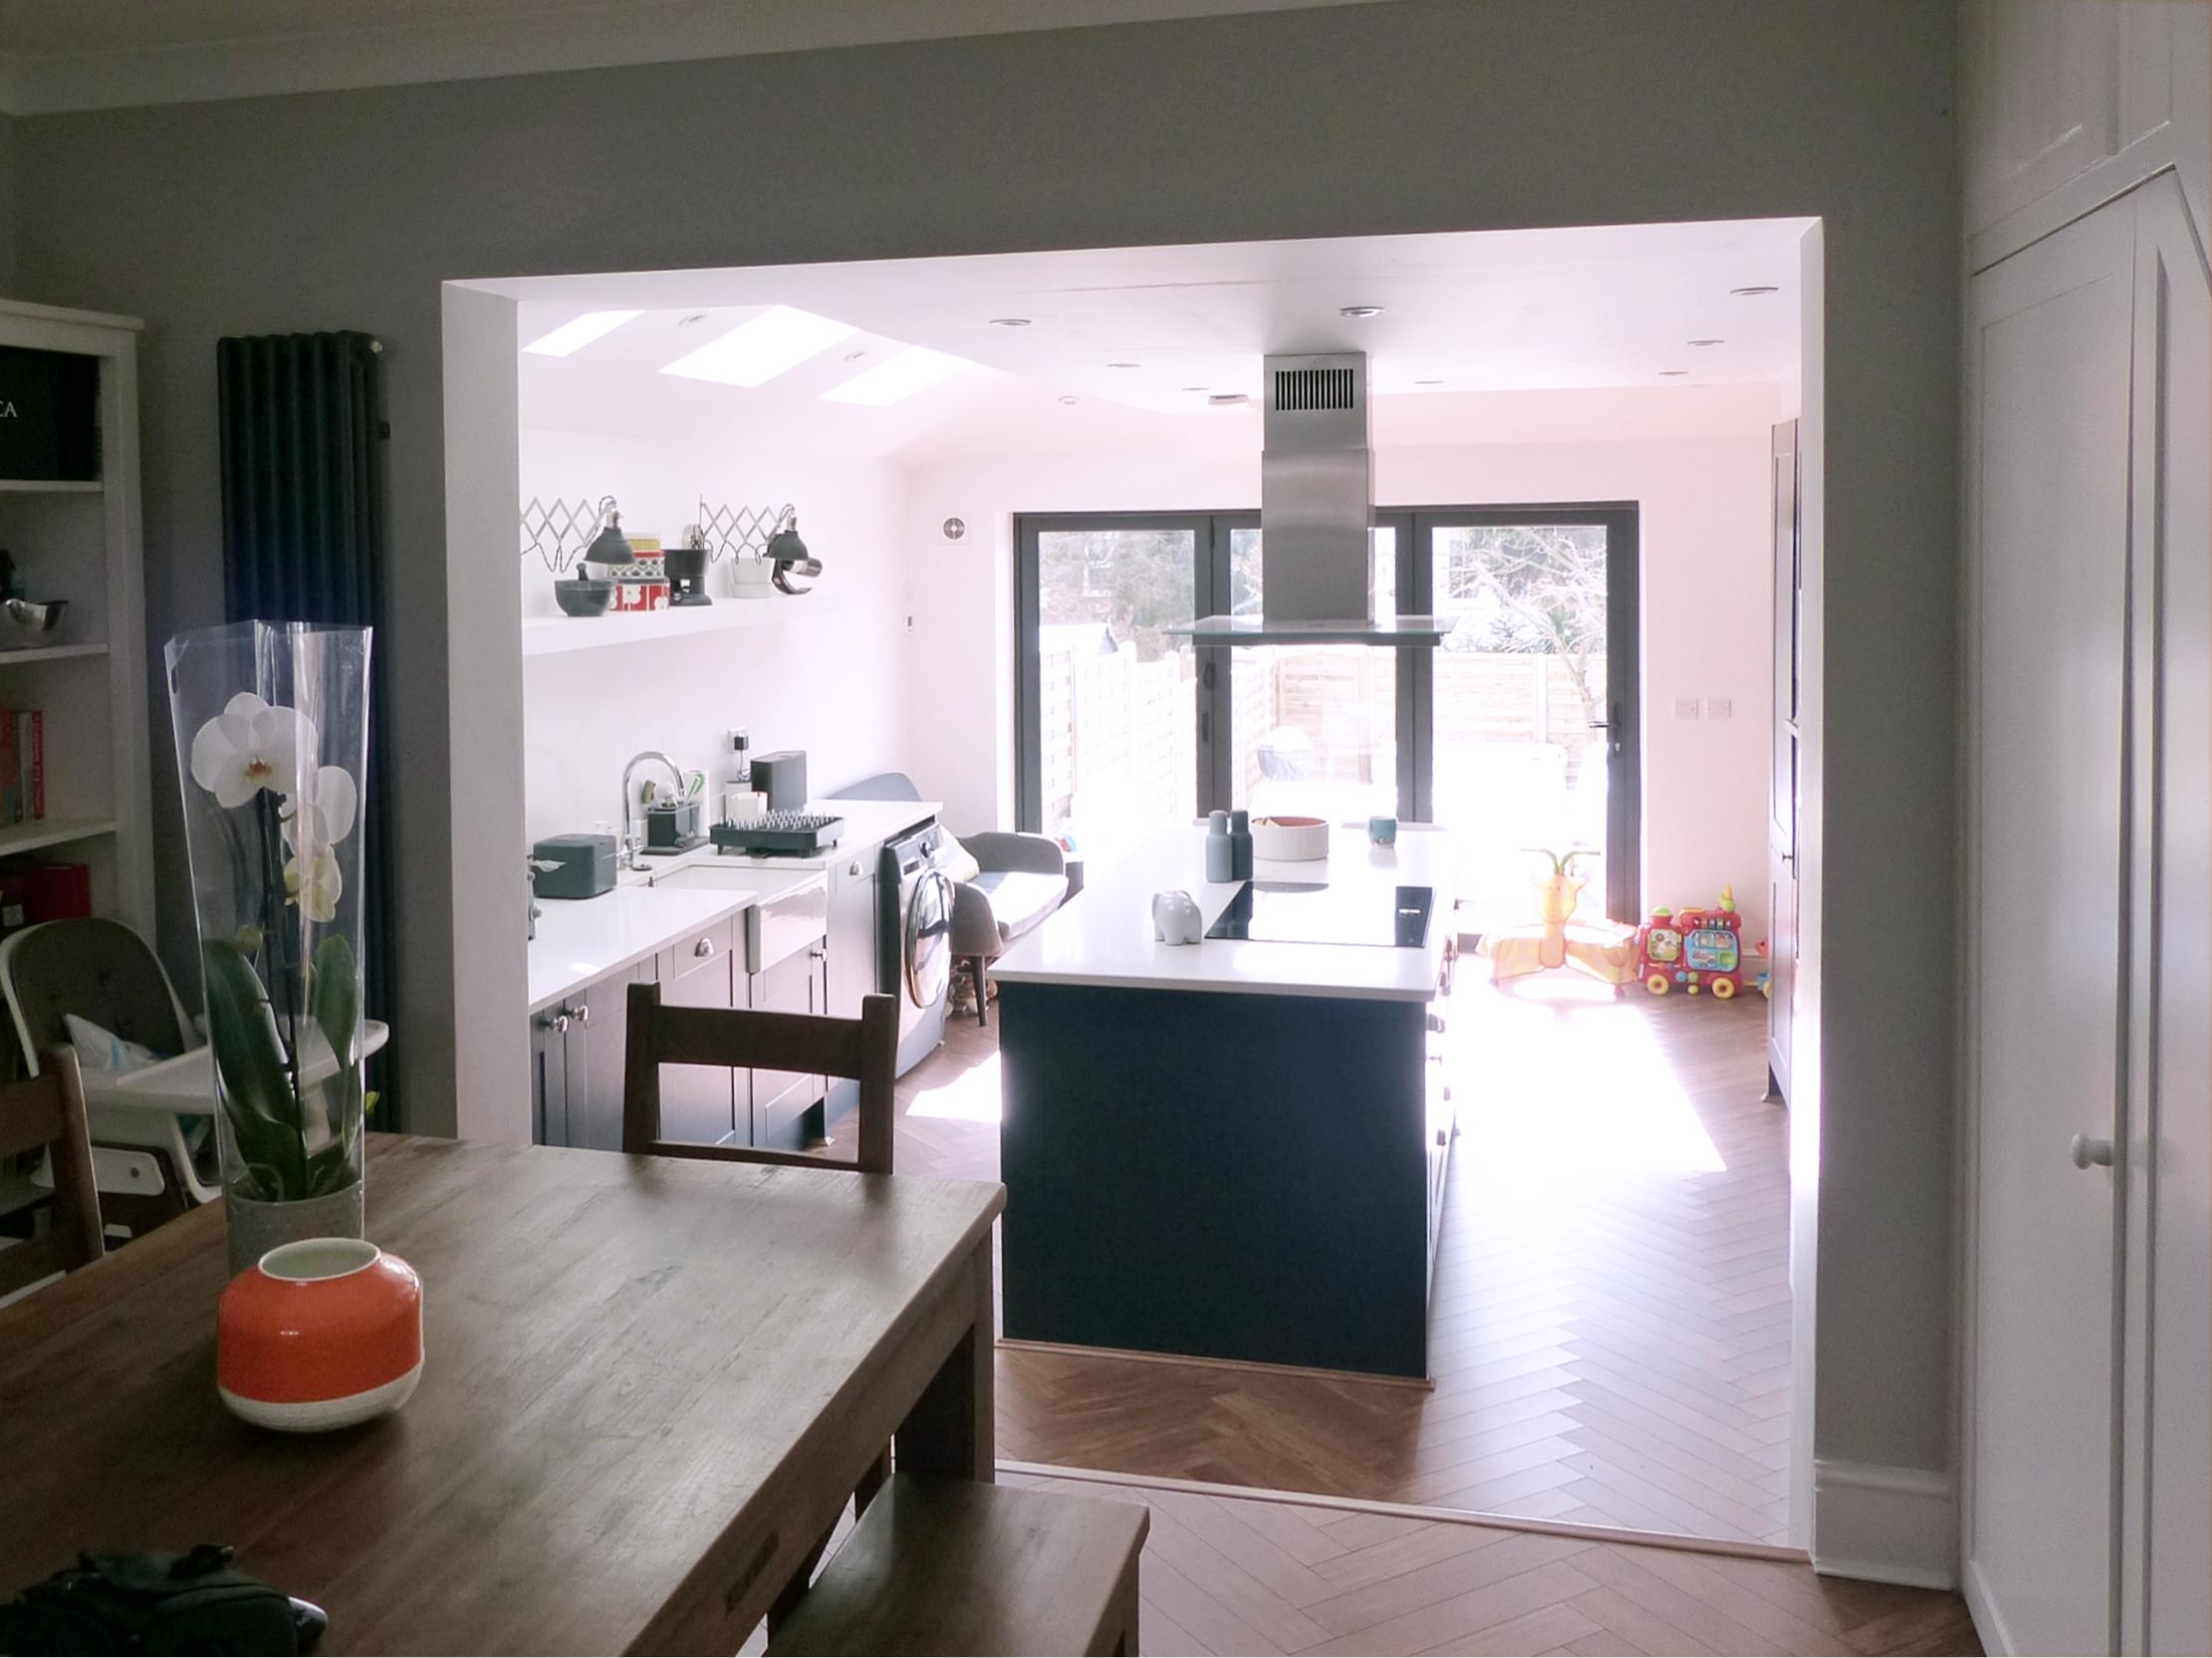 WEB View into Kitchen 4.jpg